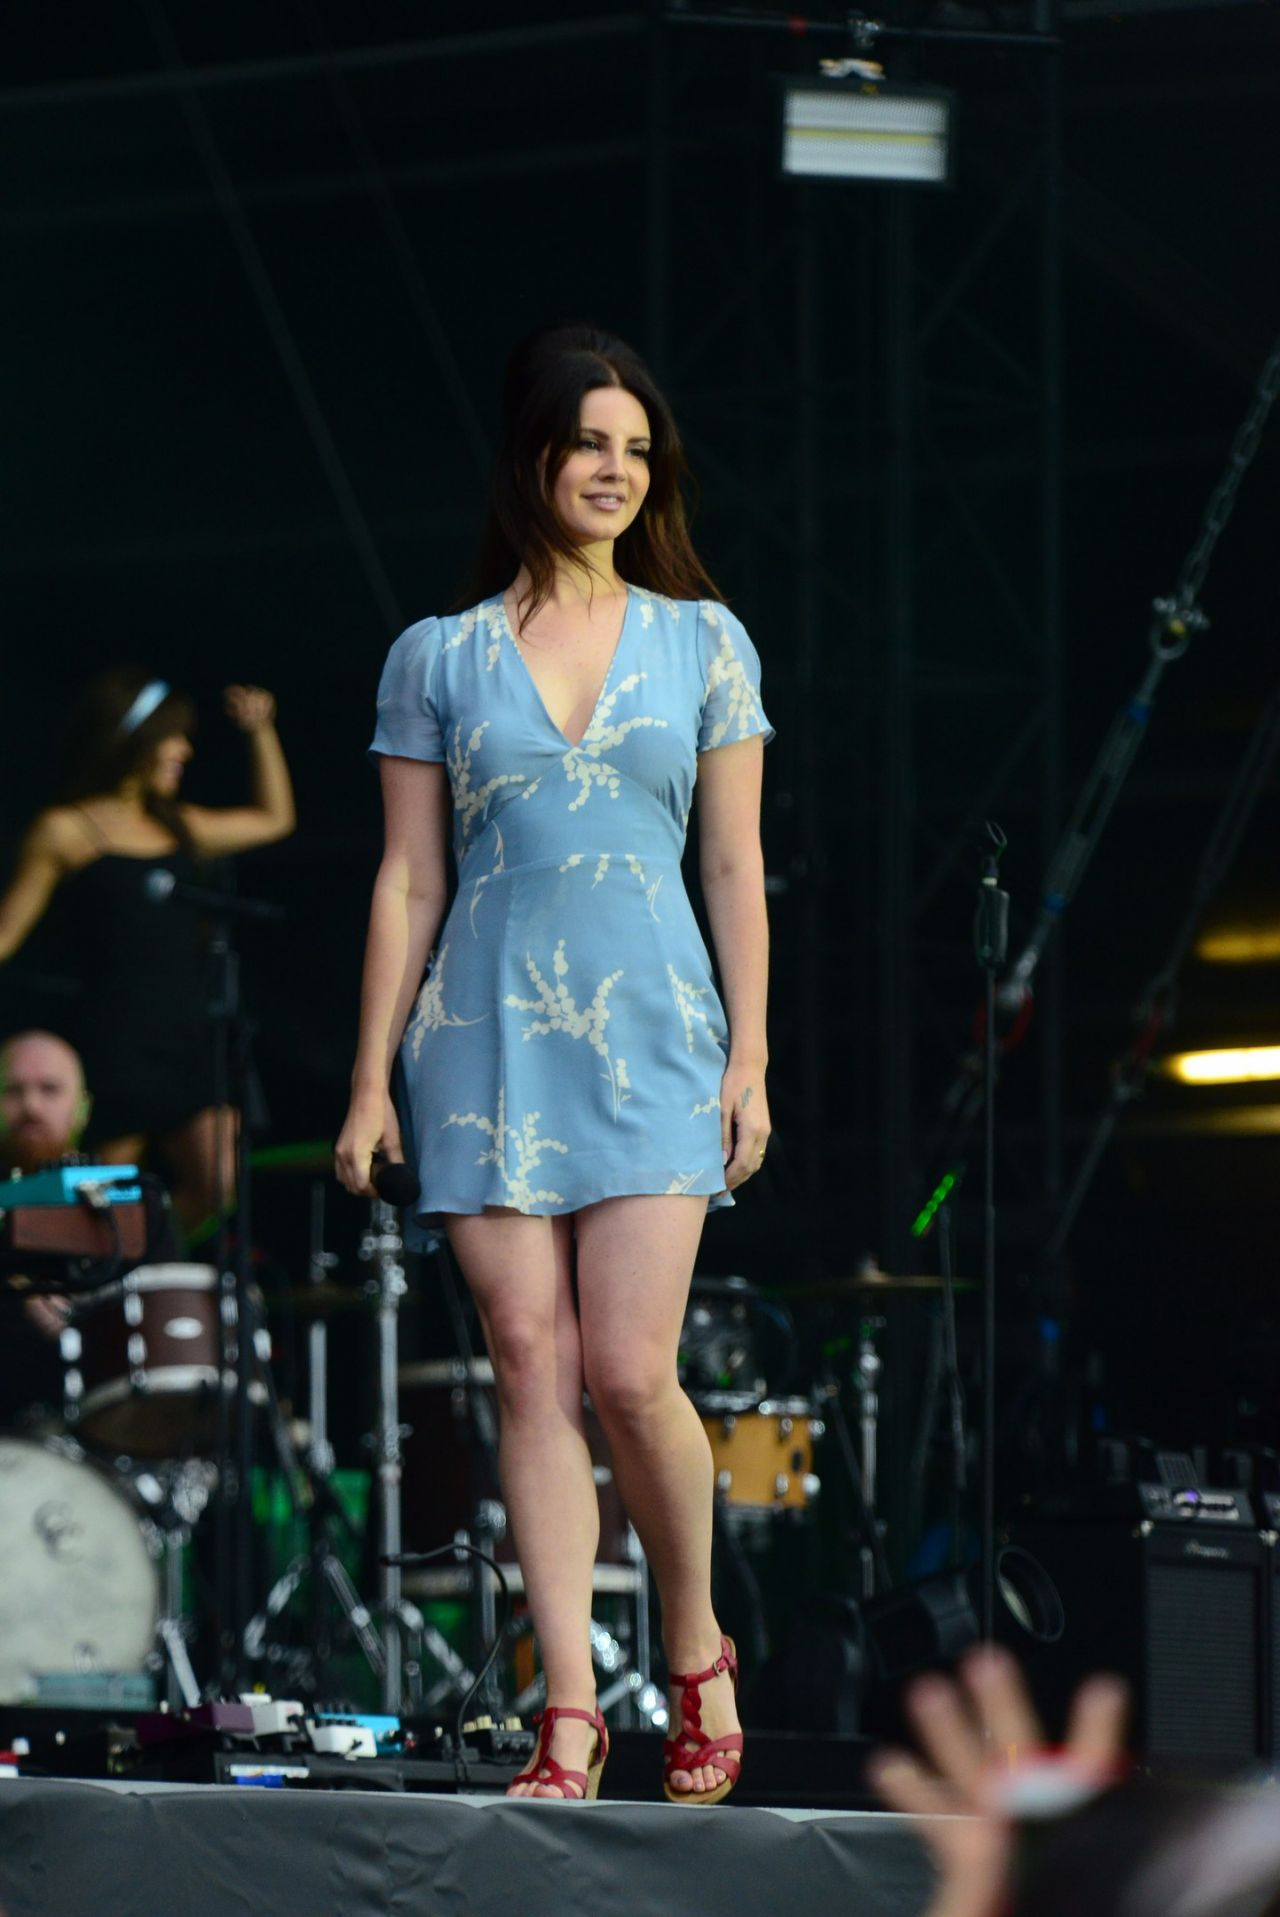 Lana Del Rey Performs Live At Lollapalooza Paris 07 23 2017